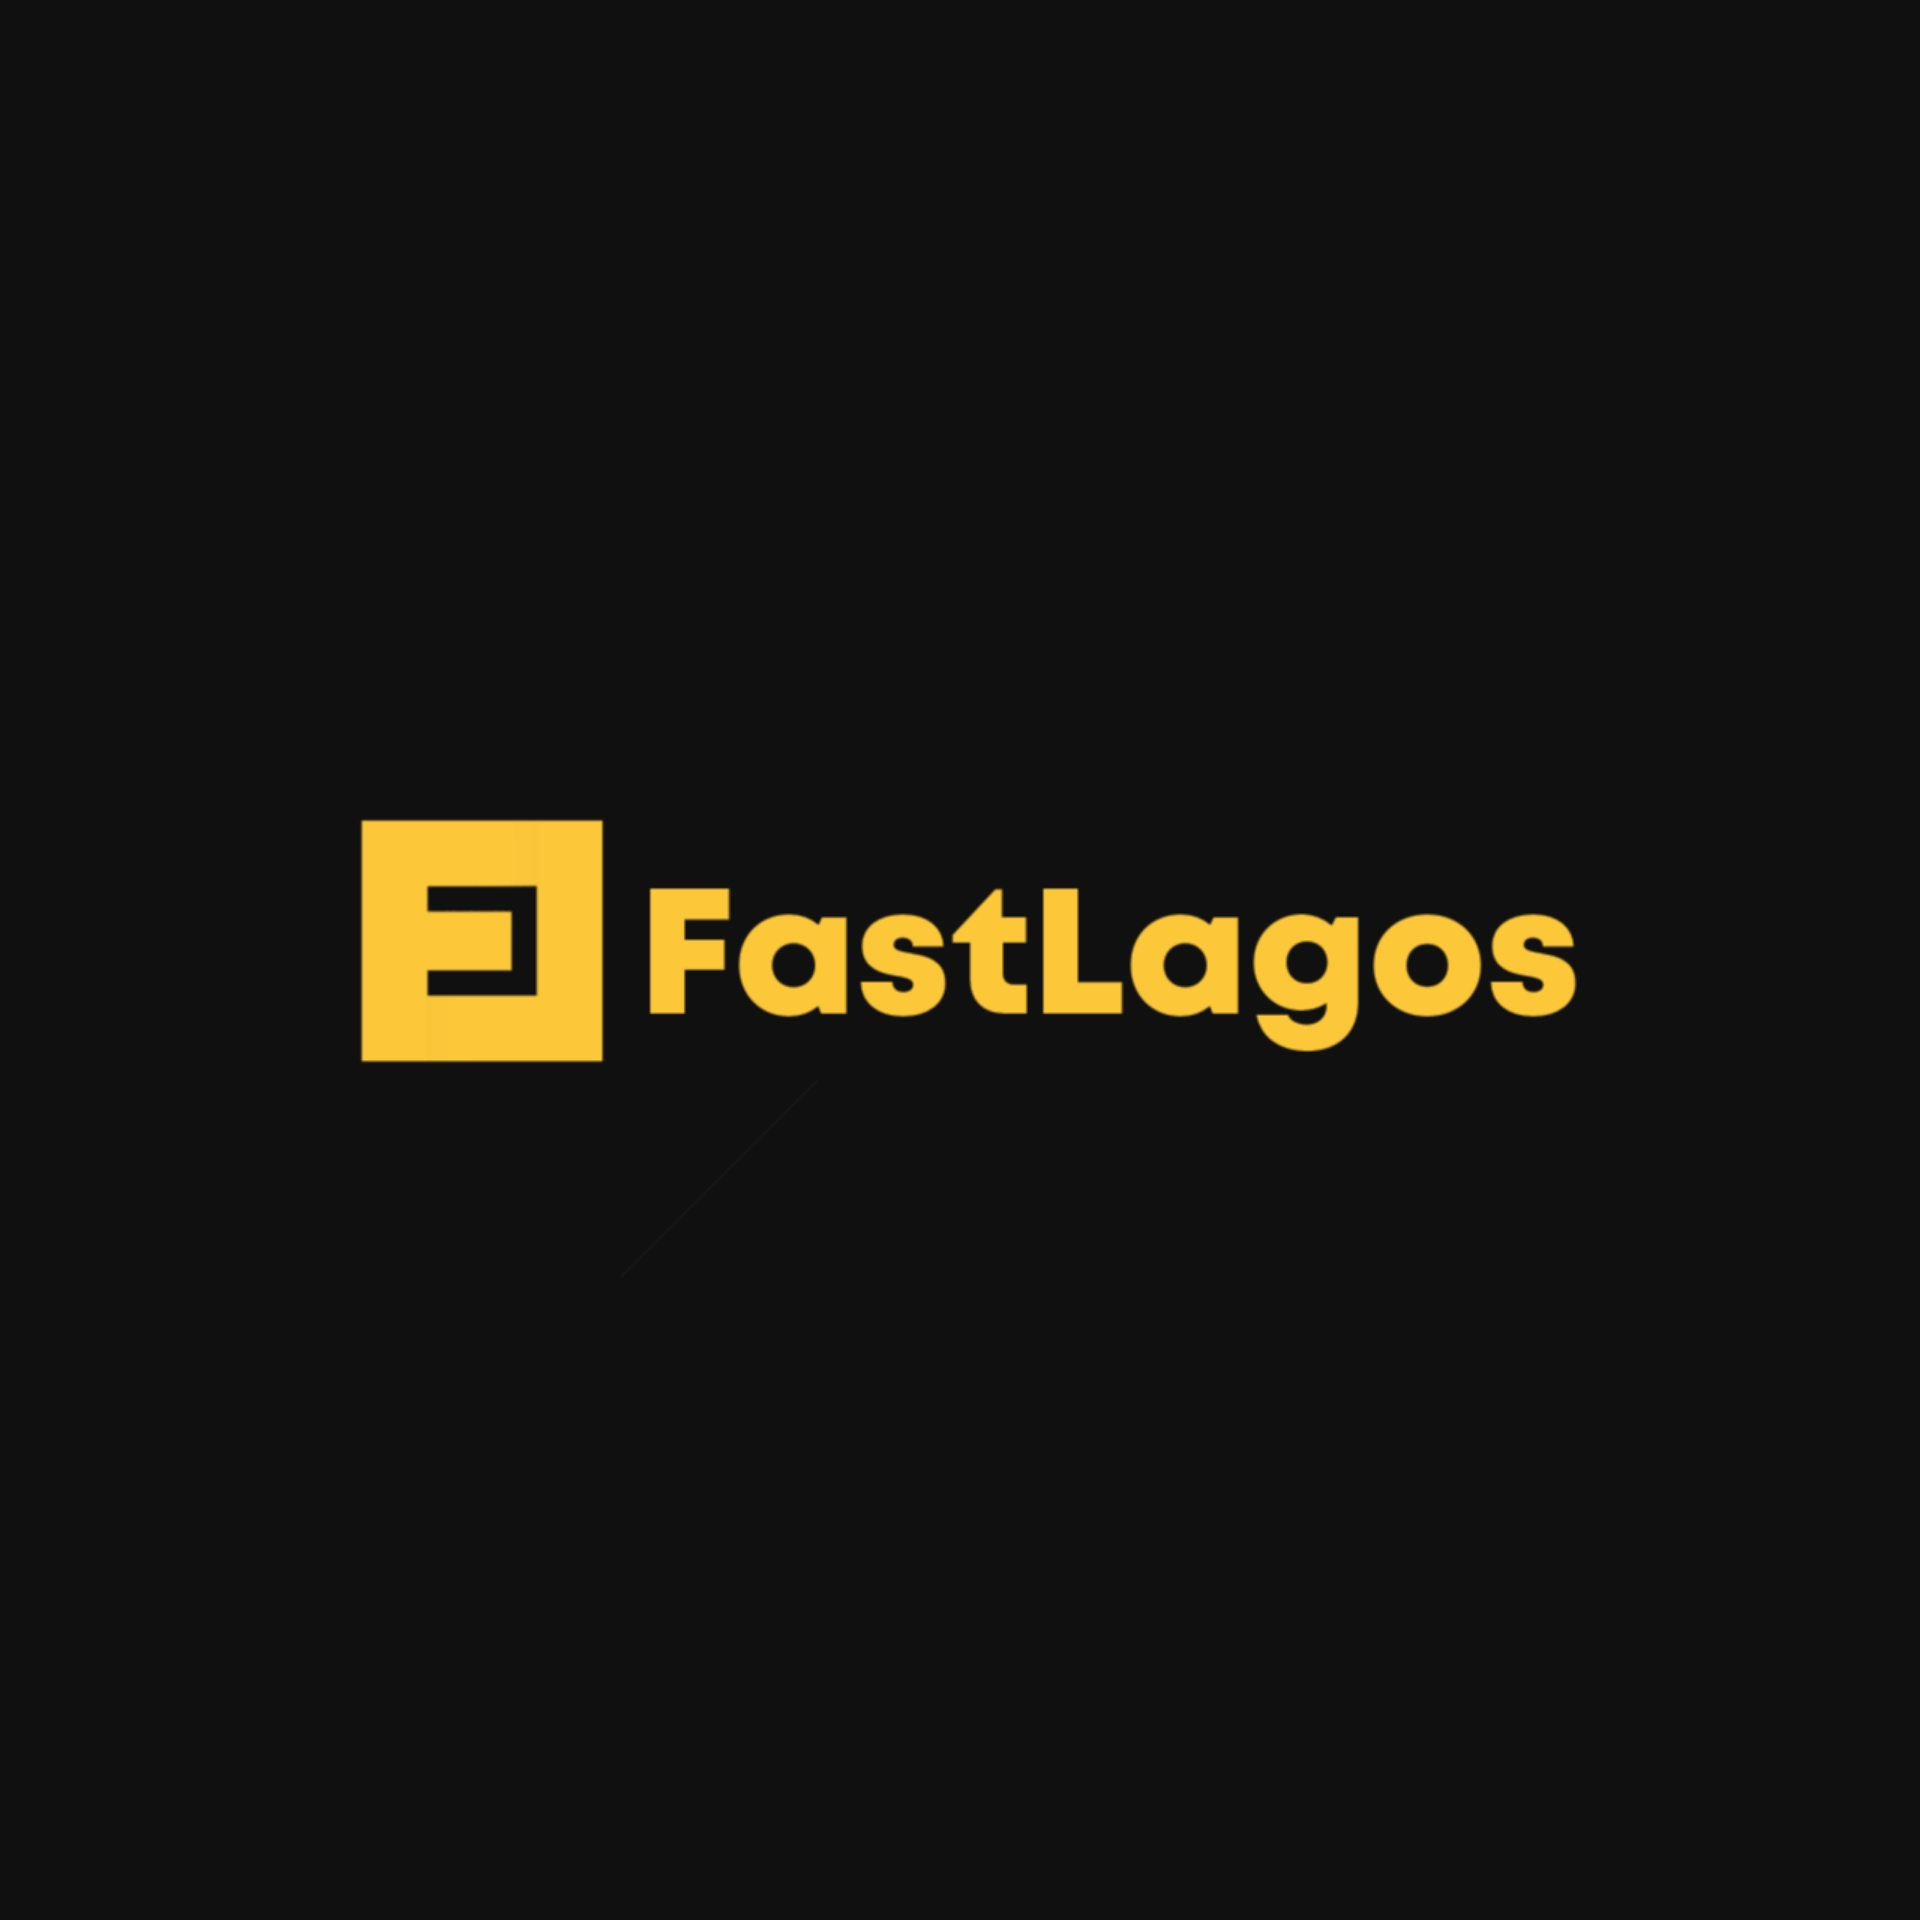 fastlagos travel blog